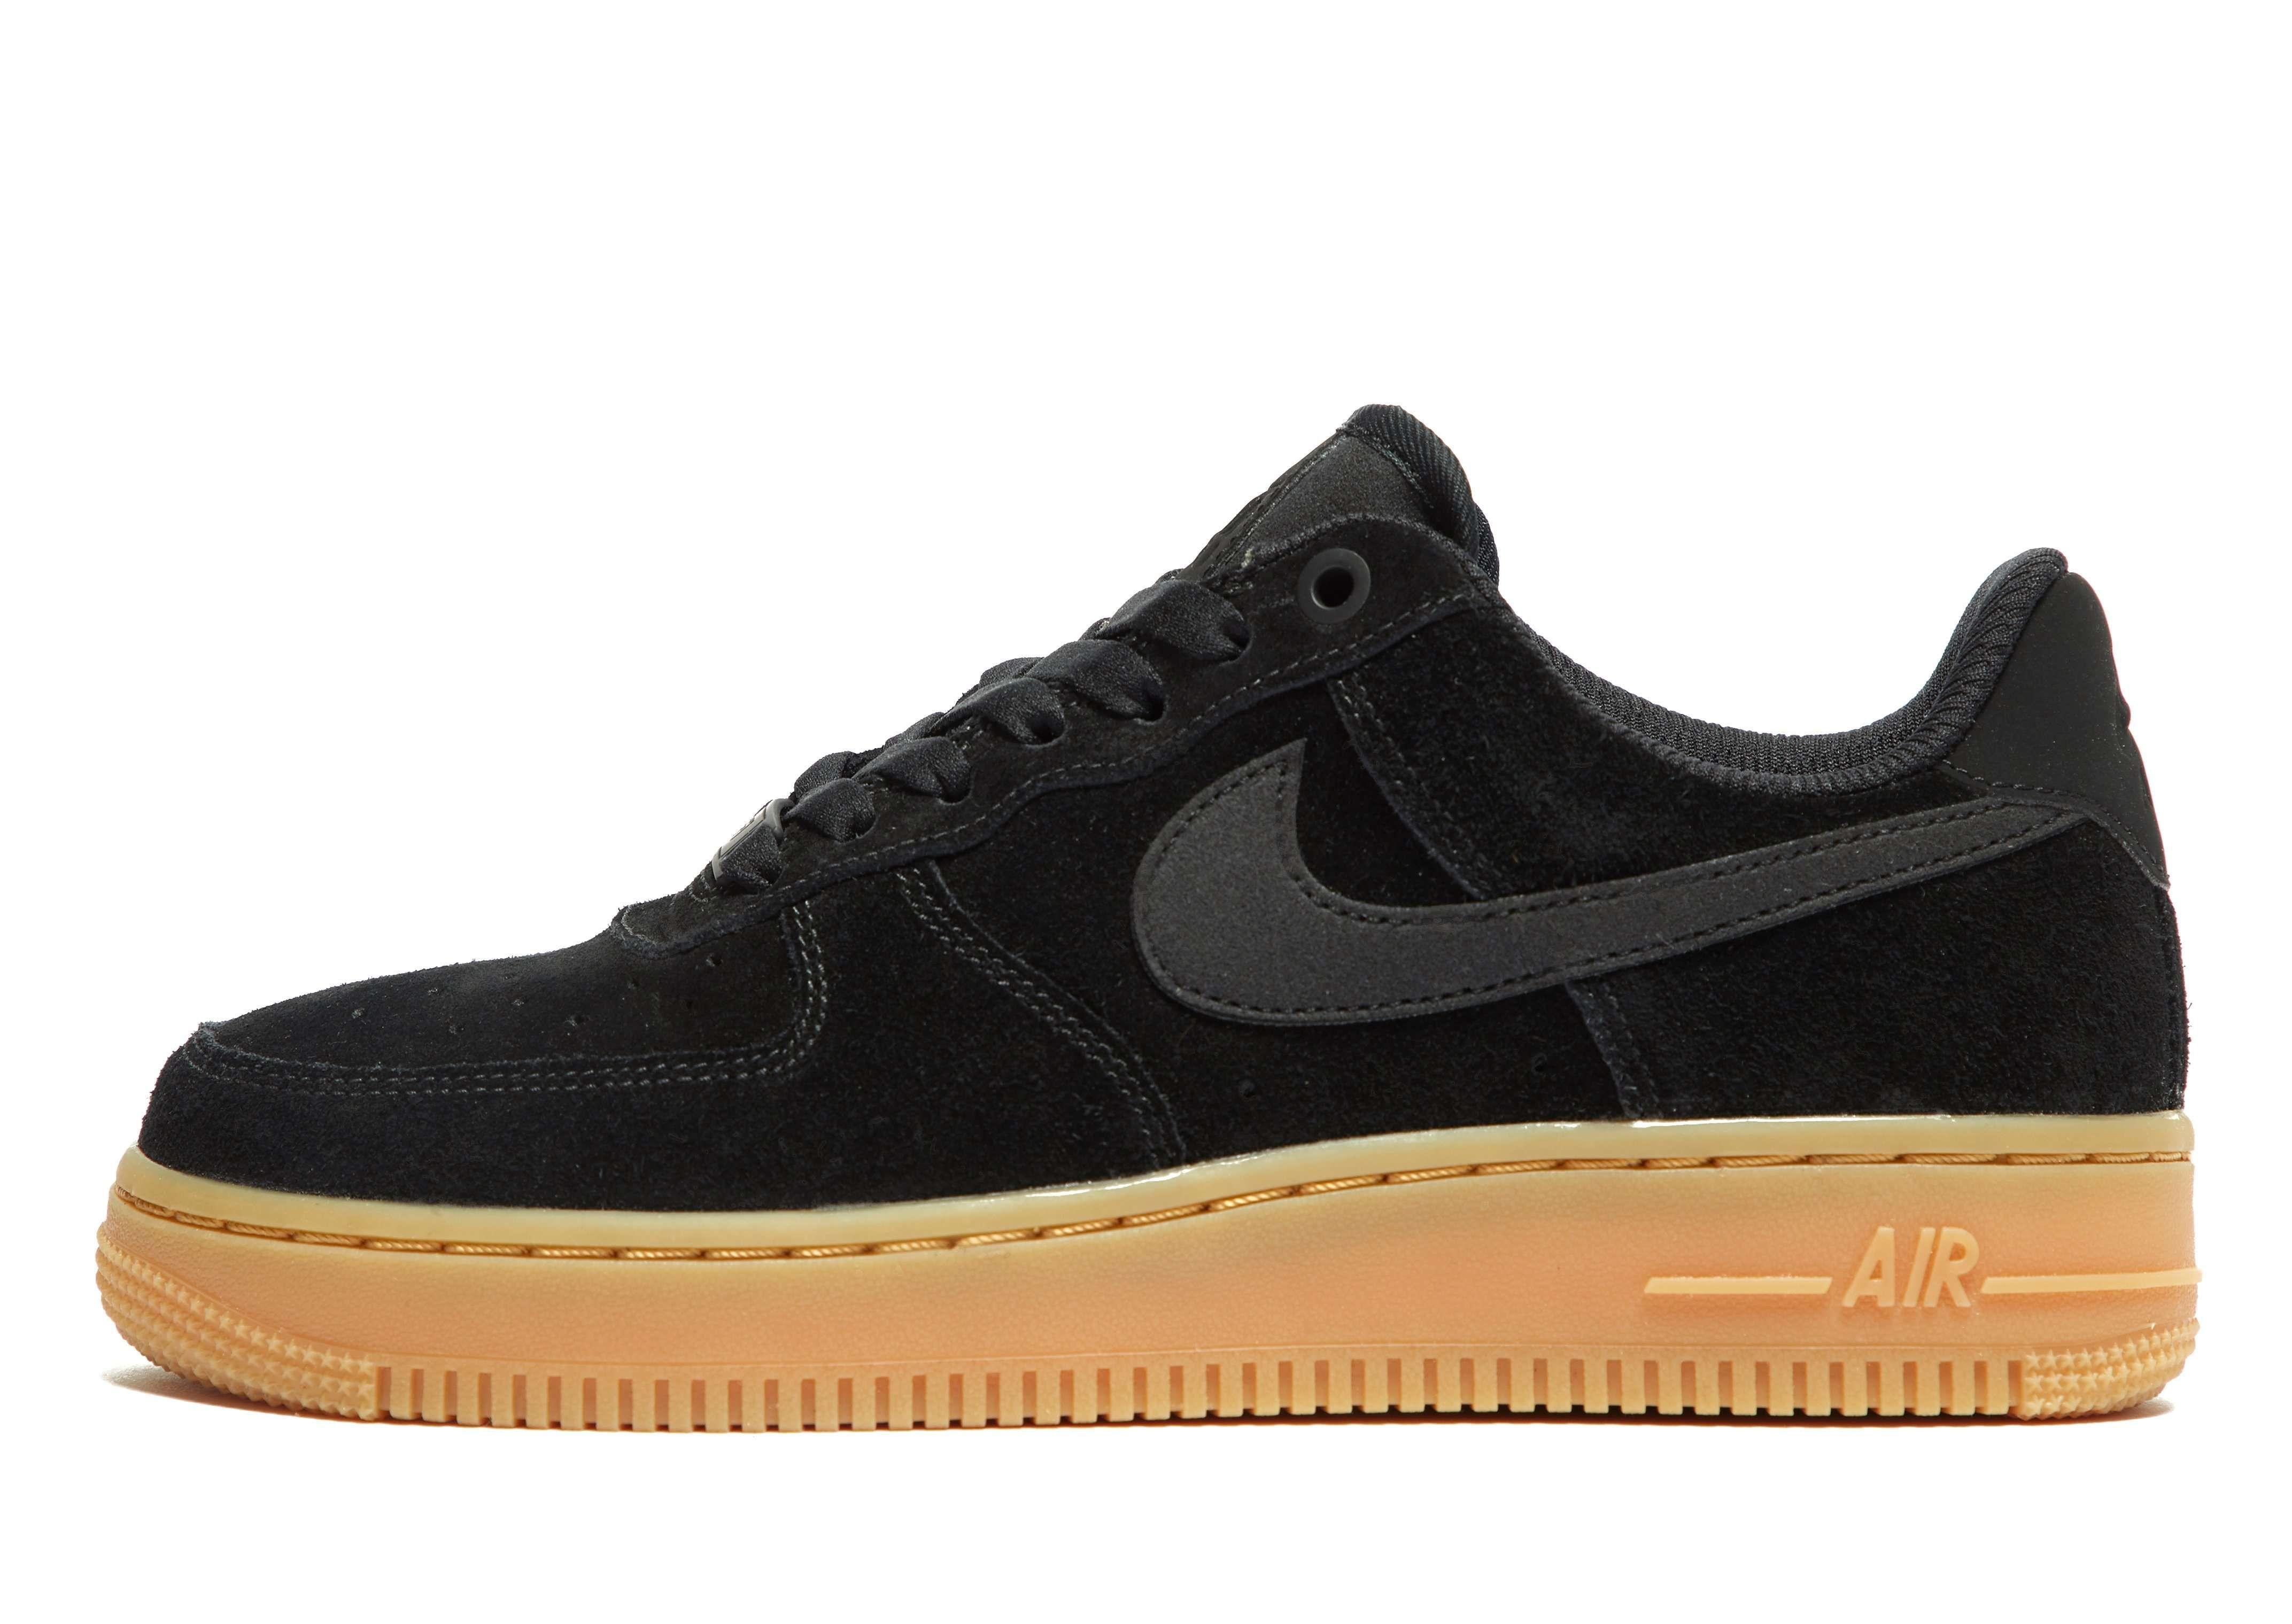 Nike Air Force 1 Low Black Royal Gum In Blackwhite gum Medium Brown game Royal